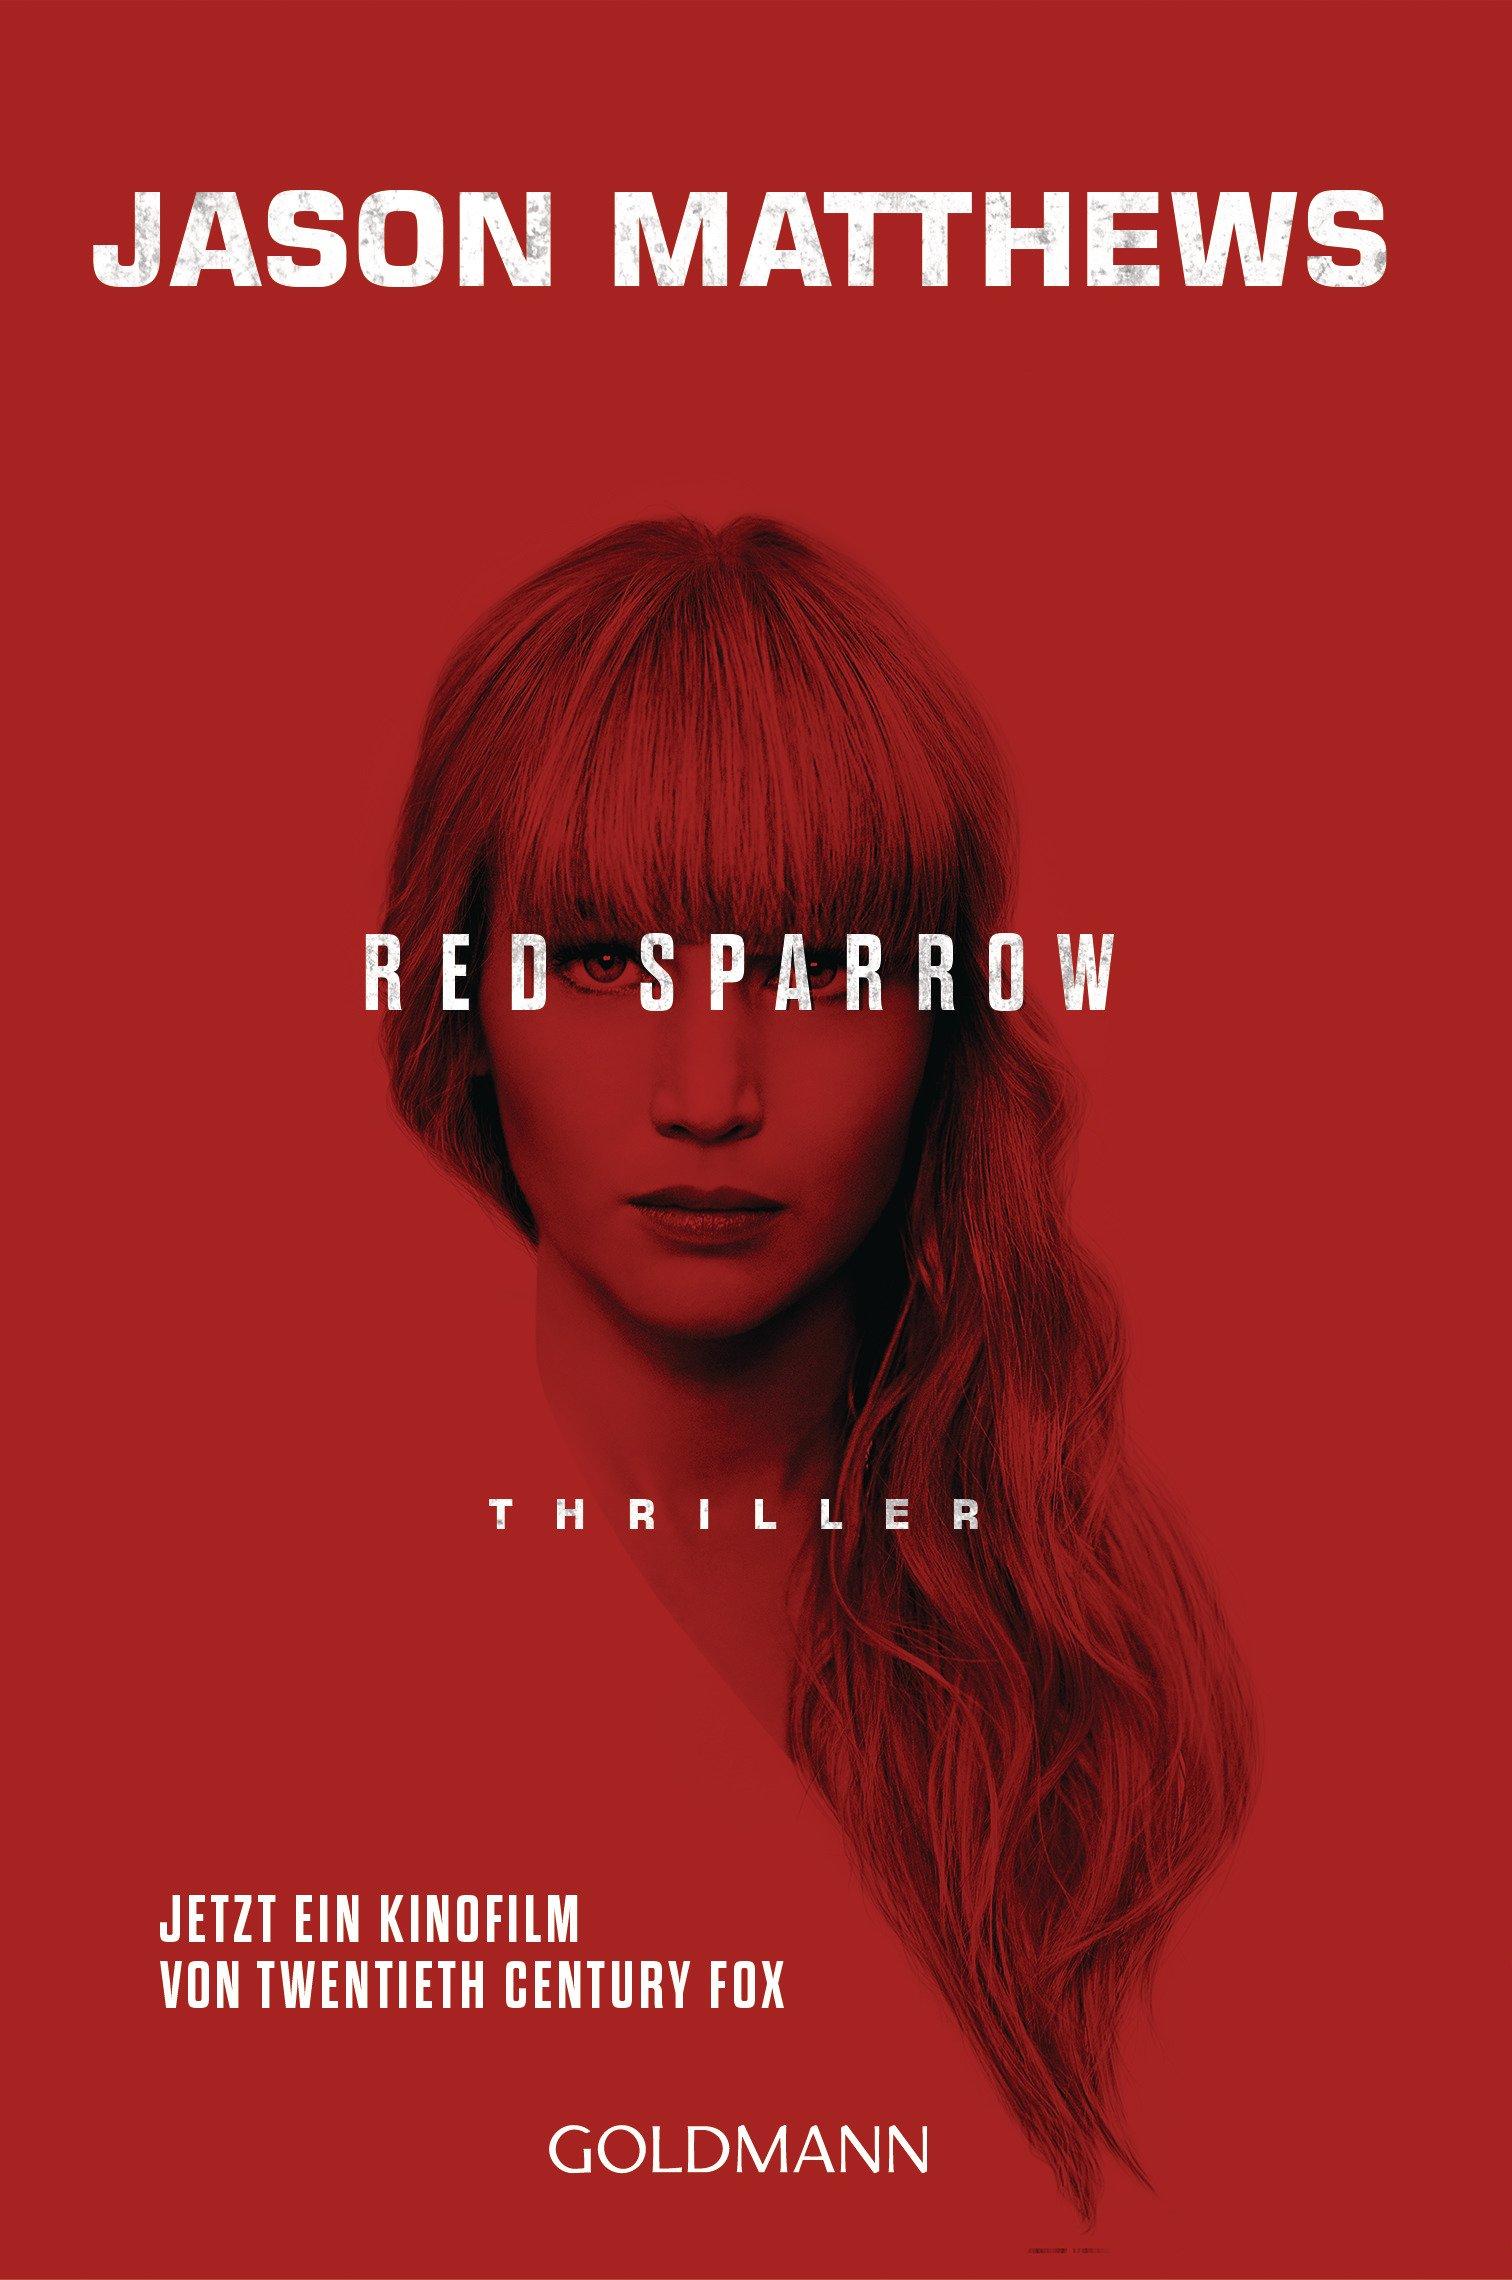 Red Sparrow: Thriller: Amazon.de: Matthews, Jason, Benthack, Michael: Bücher